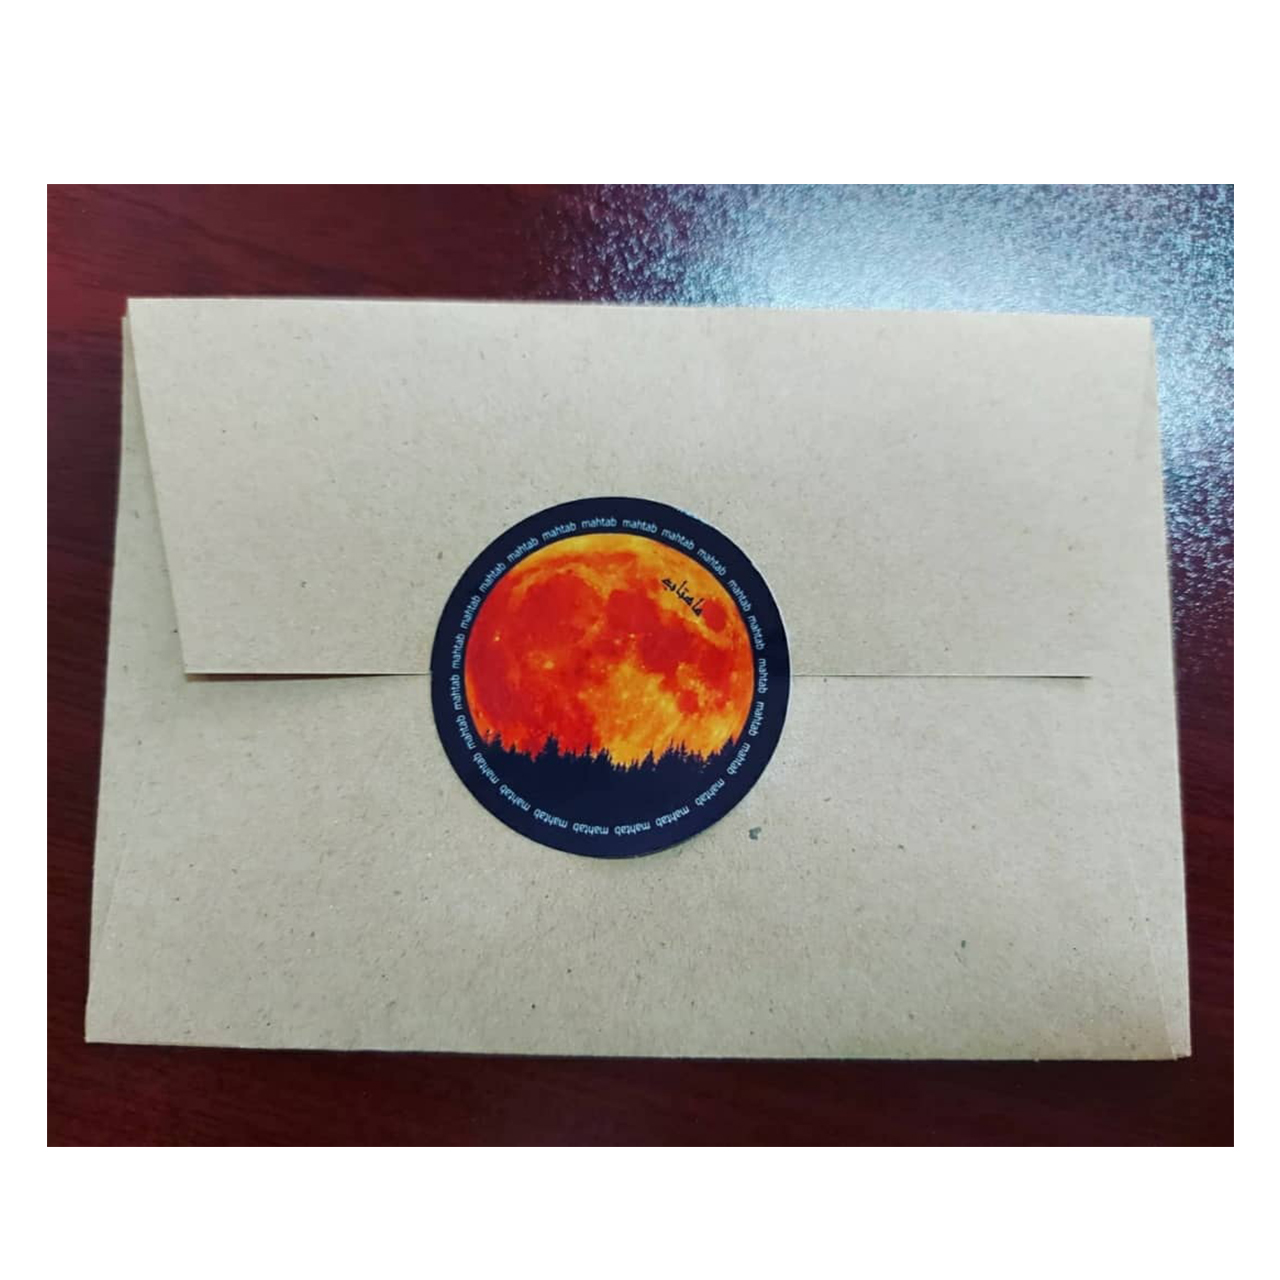 کارت پستال ماهتاب طرح پیوندتان مبارک کد 1902